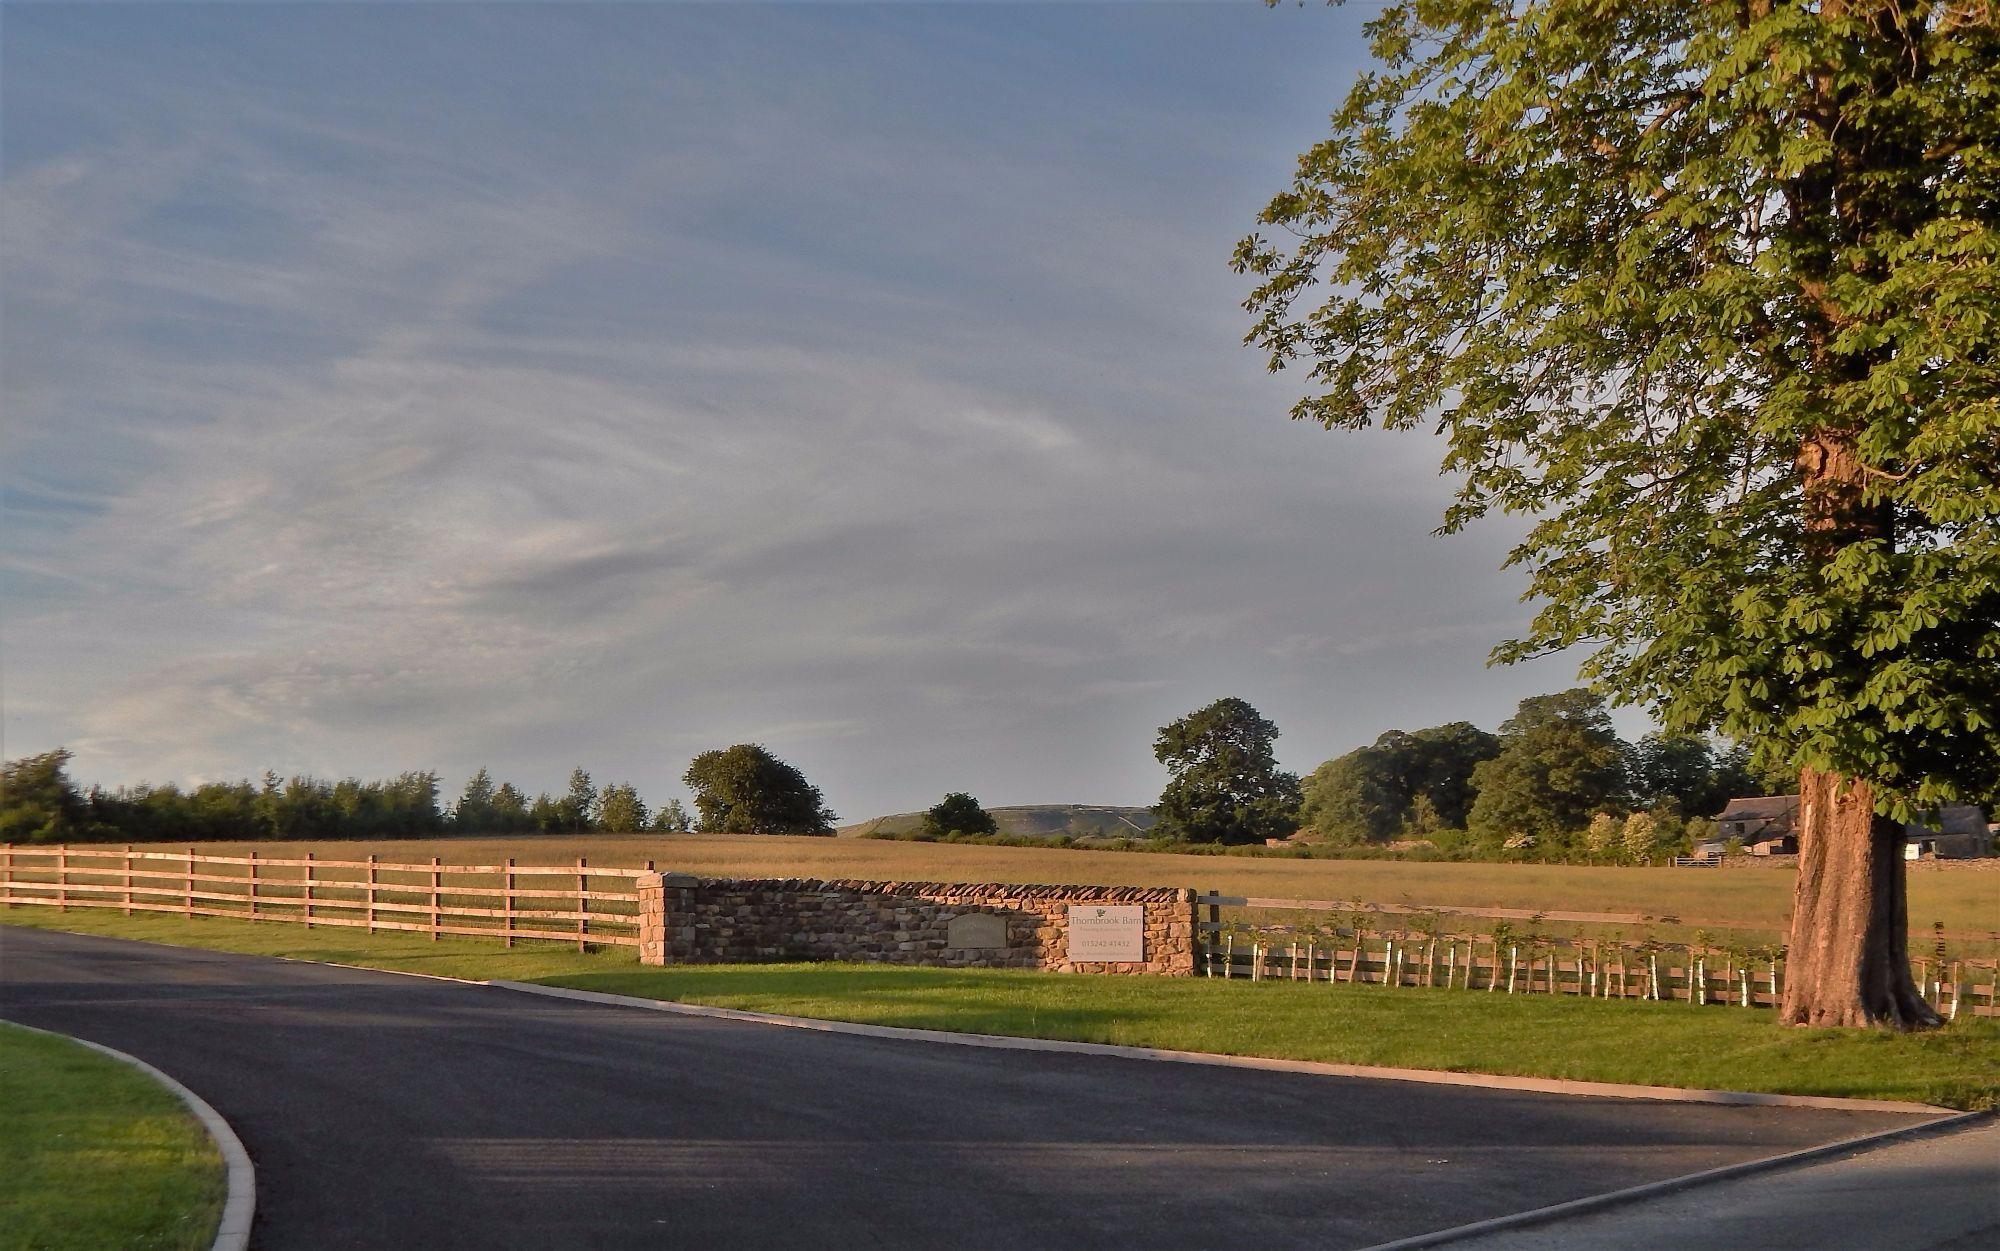 Site entrance at Thornbrook Barn Touring Caravan Site